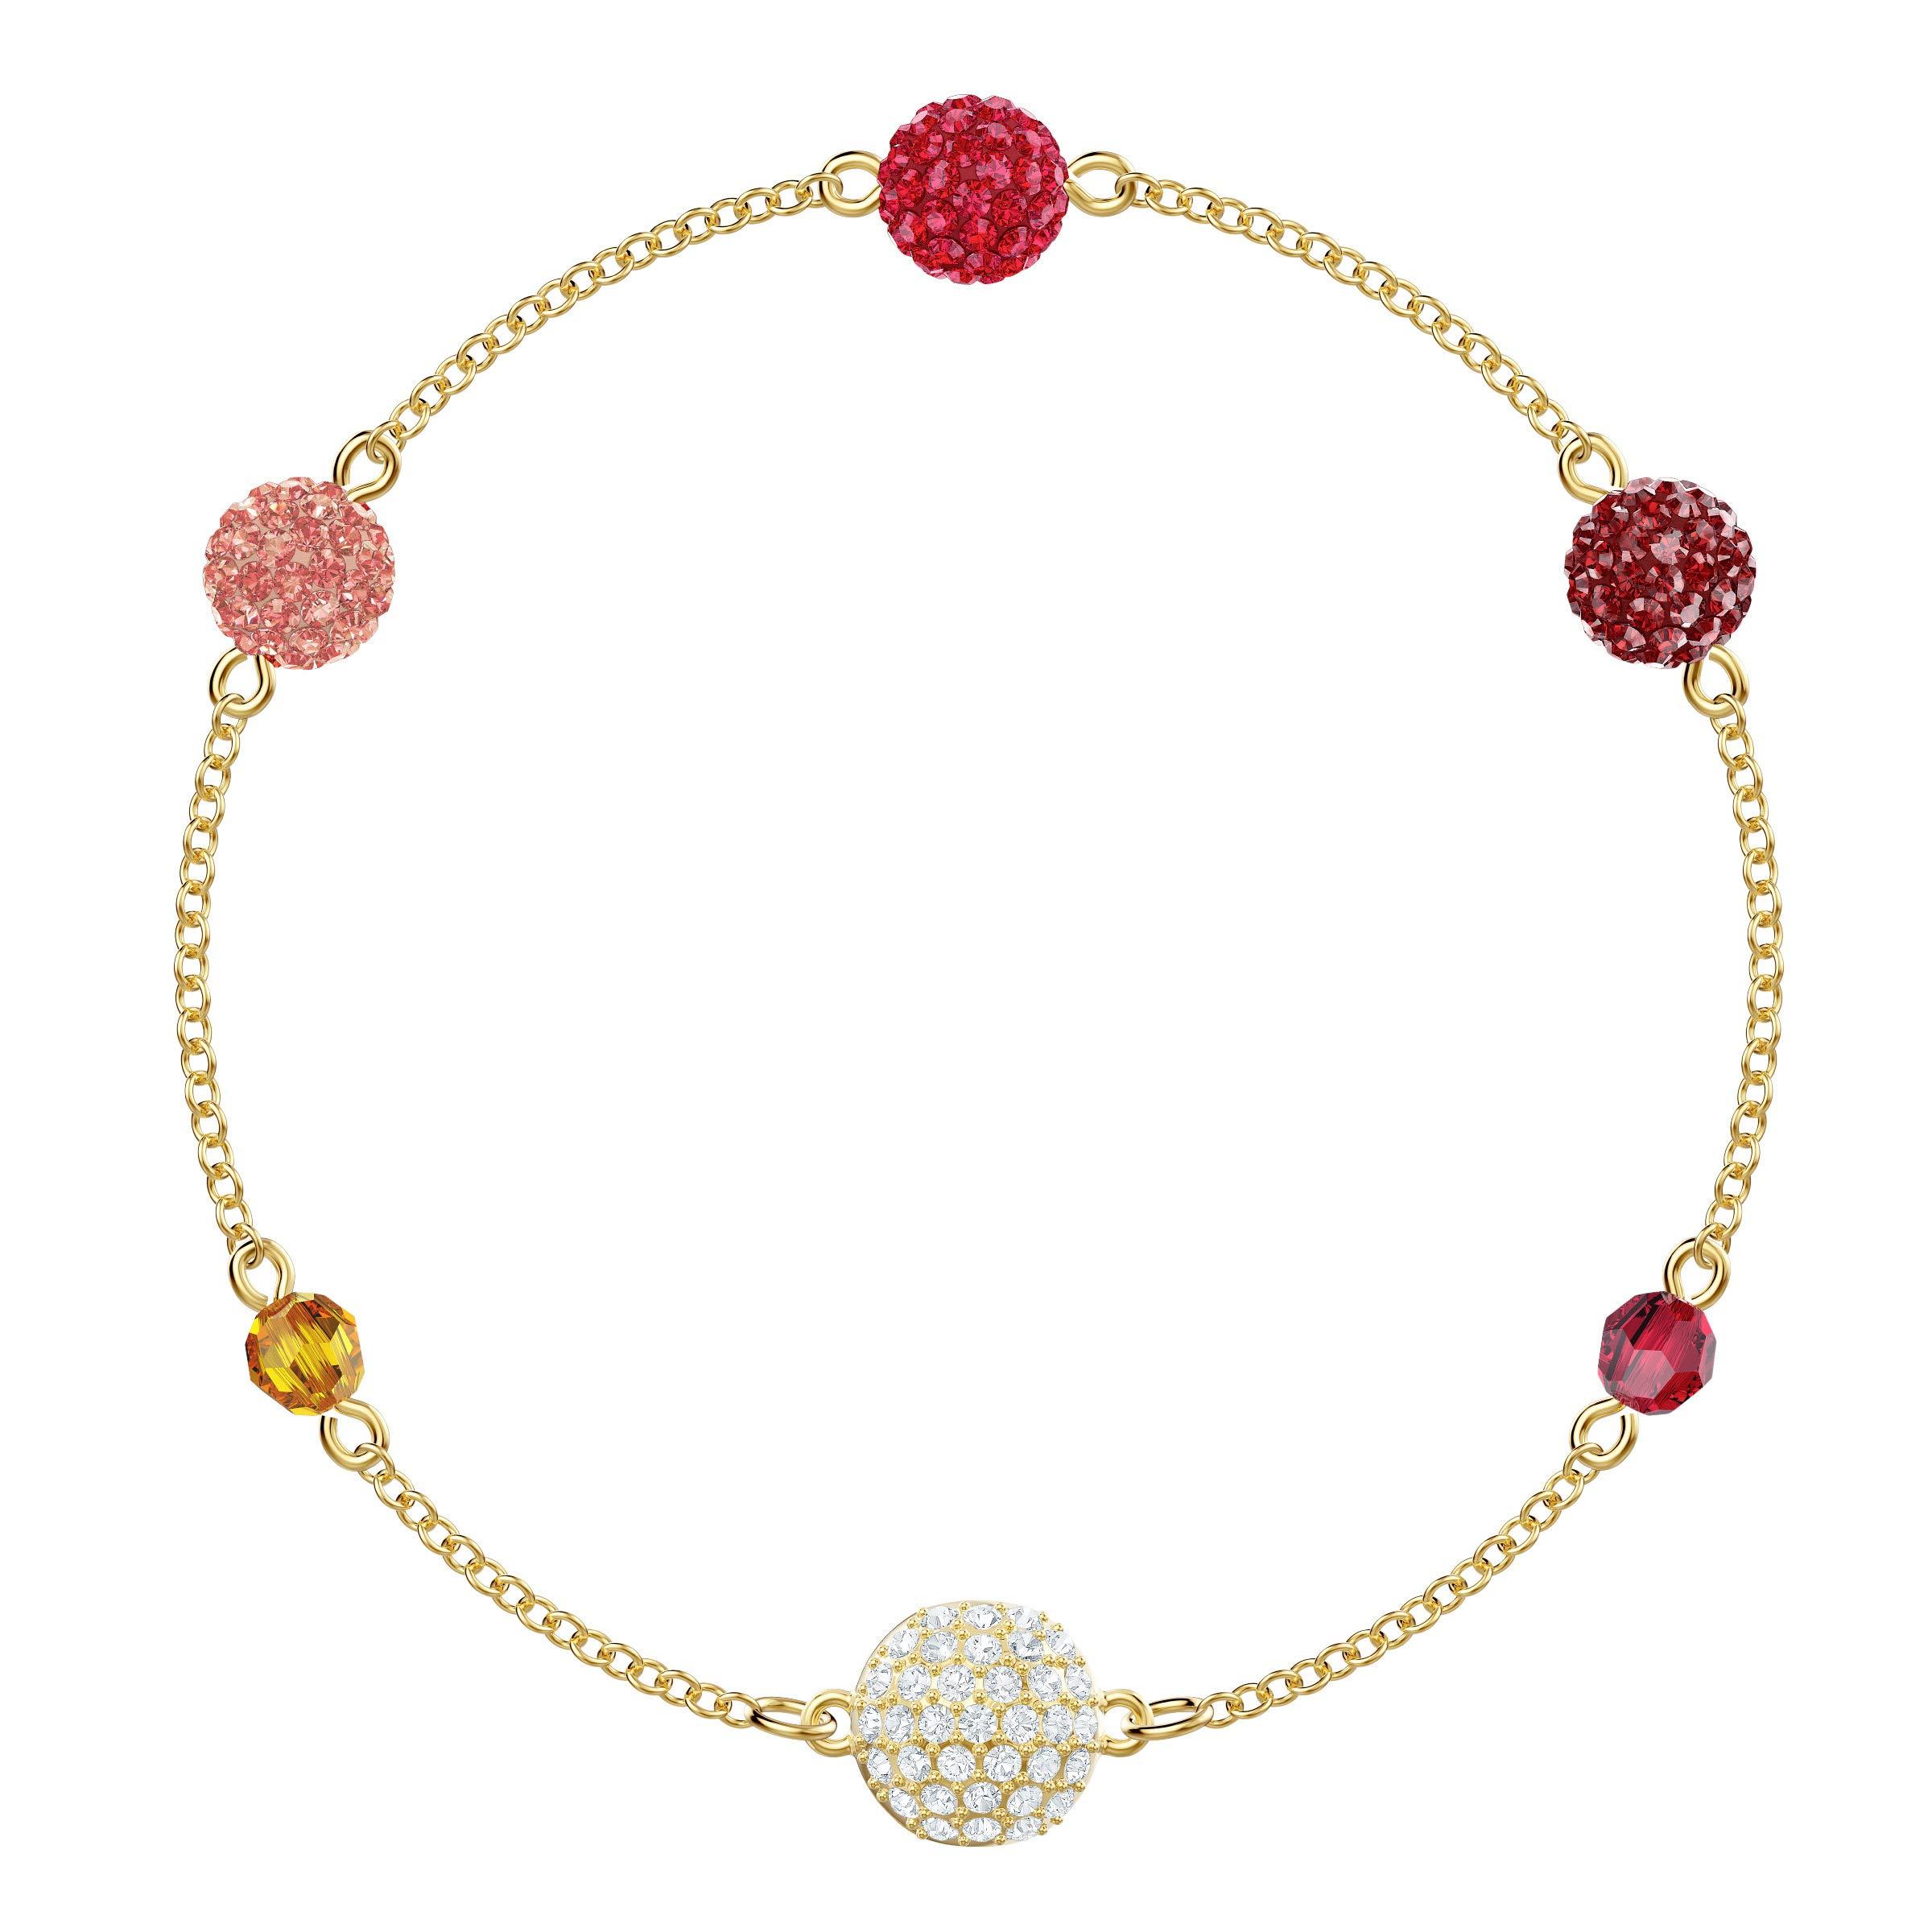 Swarovski Women's Strand Bracelet, Brilliant Crystals, Magnetic Closure, from the Swarovski Remix Collection